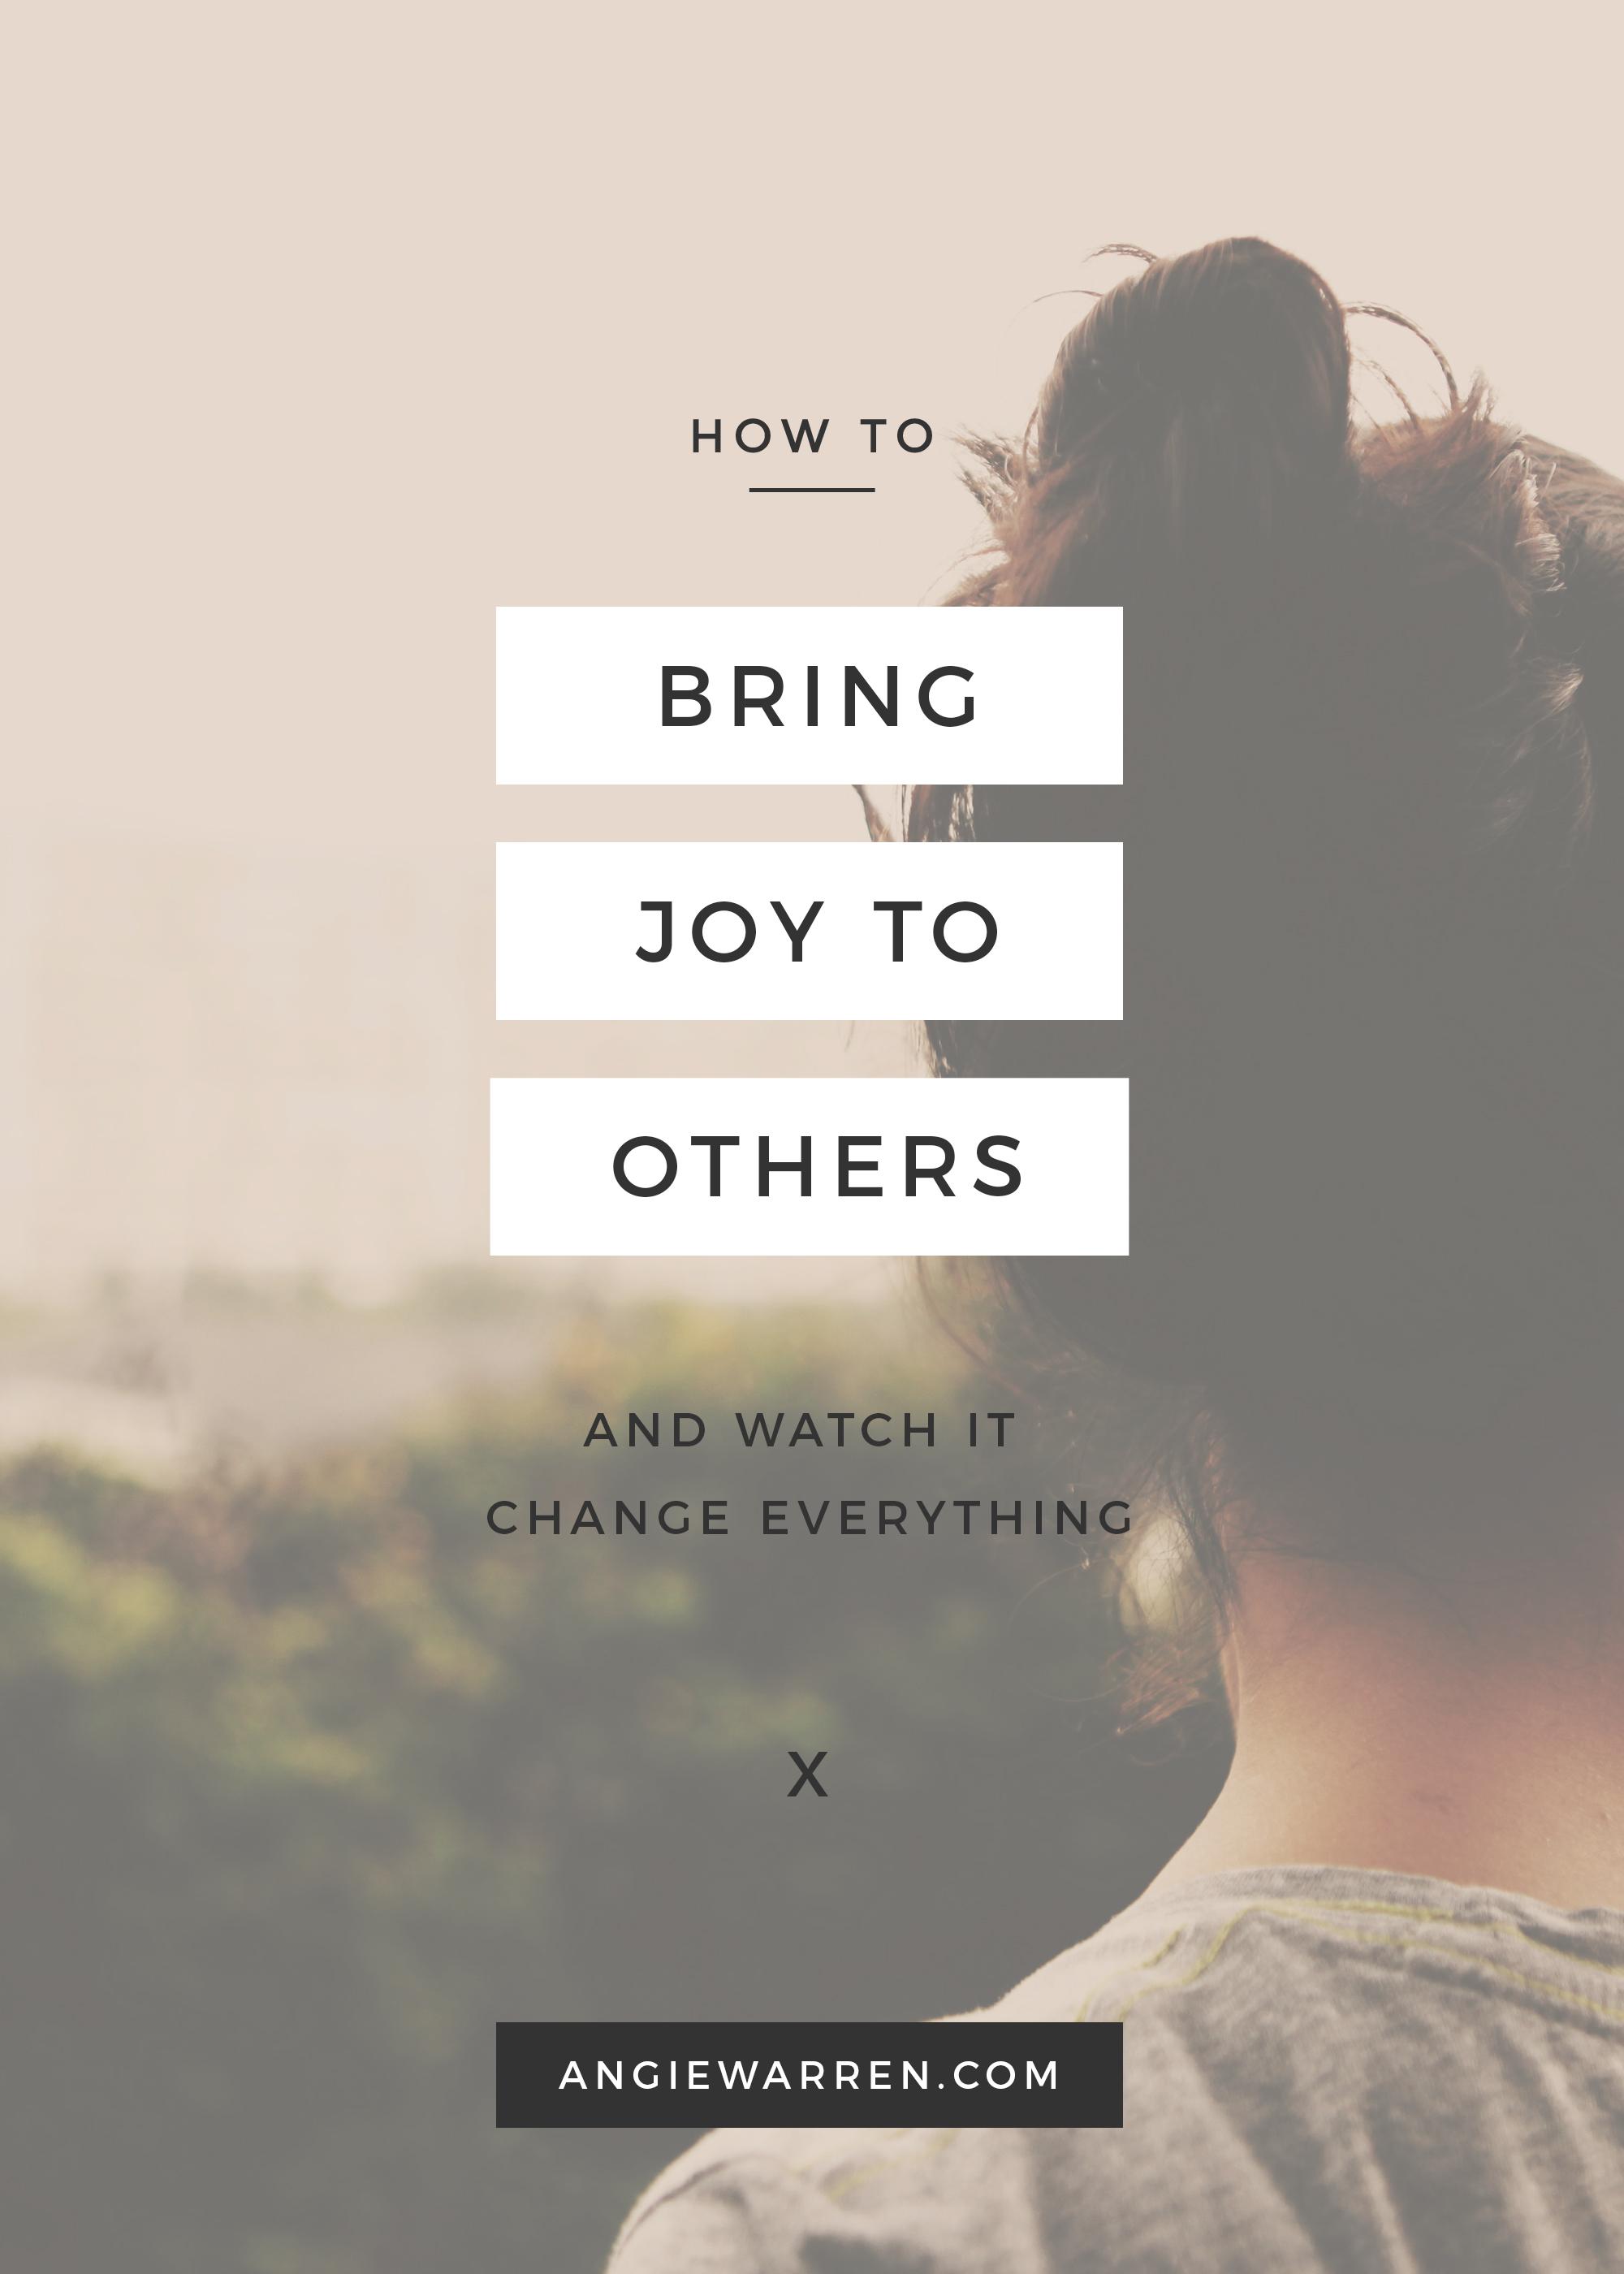 HOW TO BRING JOY TO OTHERS // www.angiewarren.com